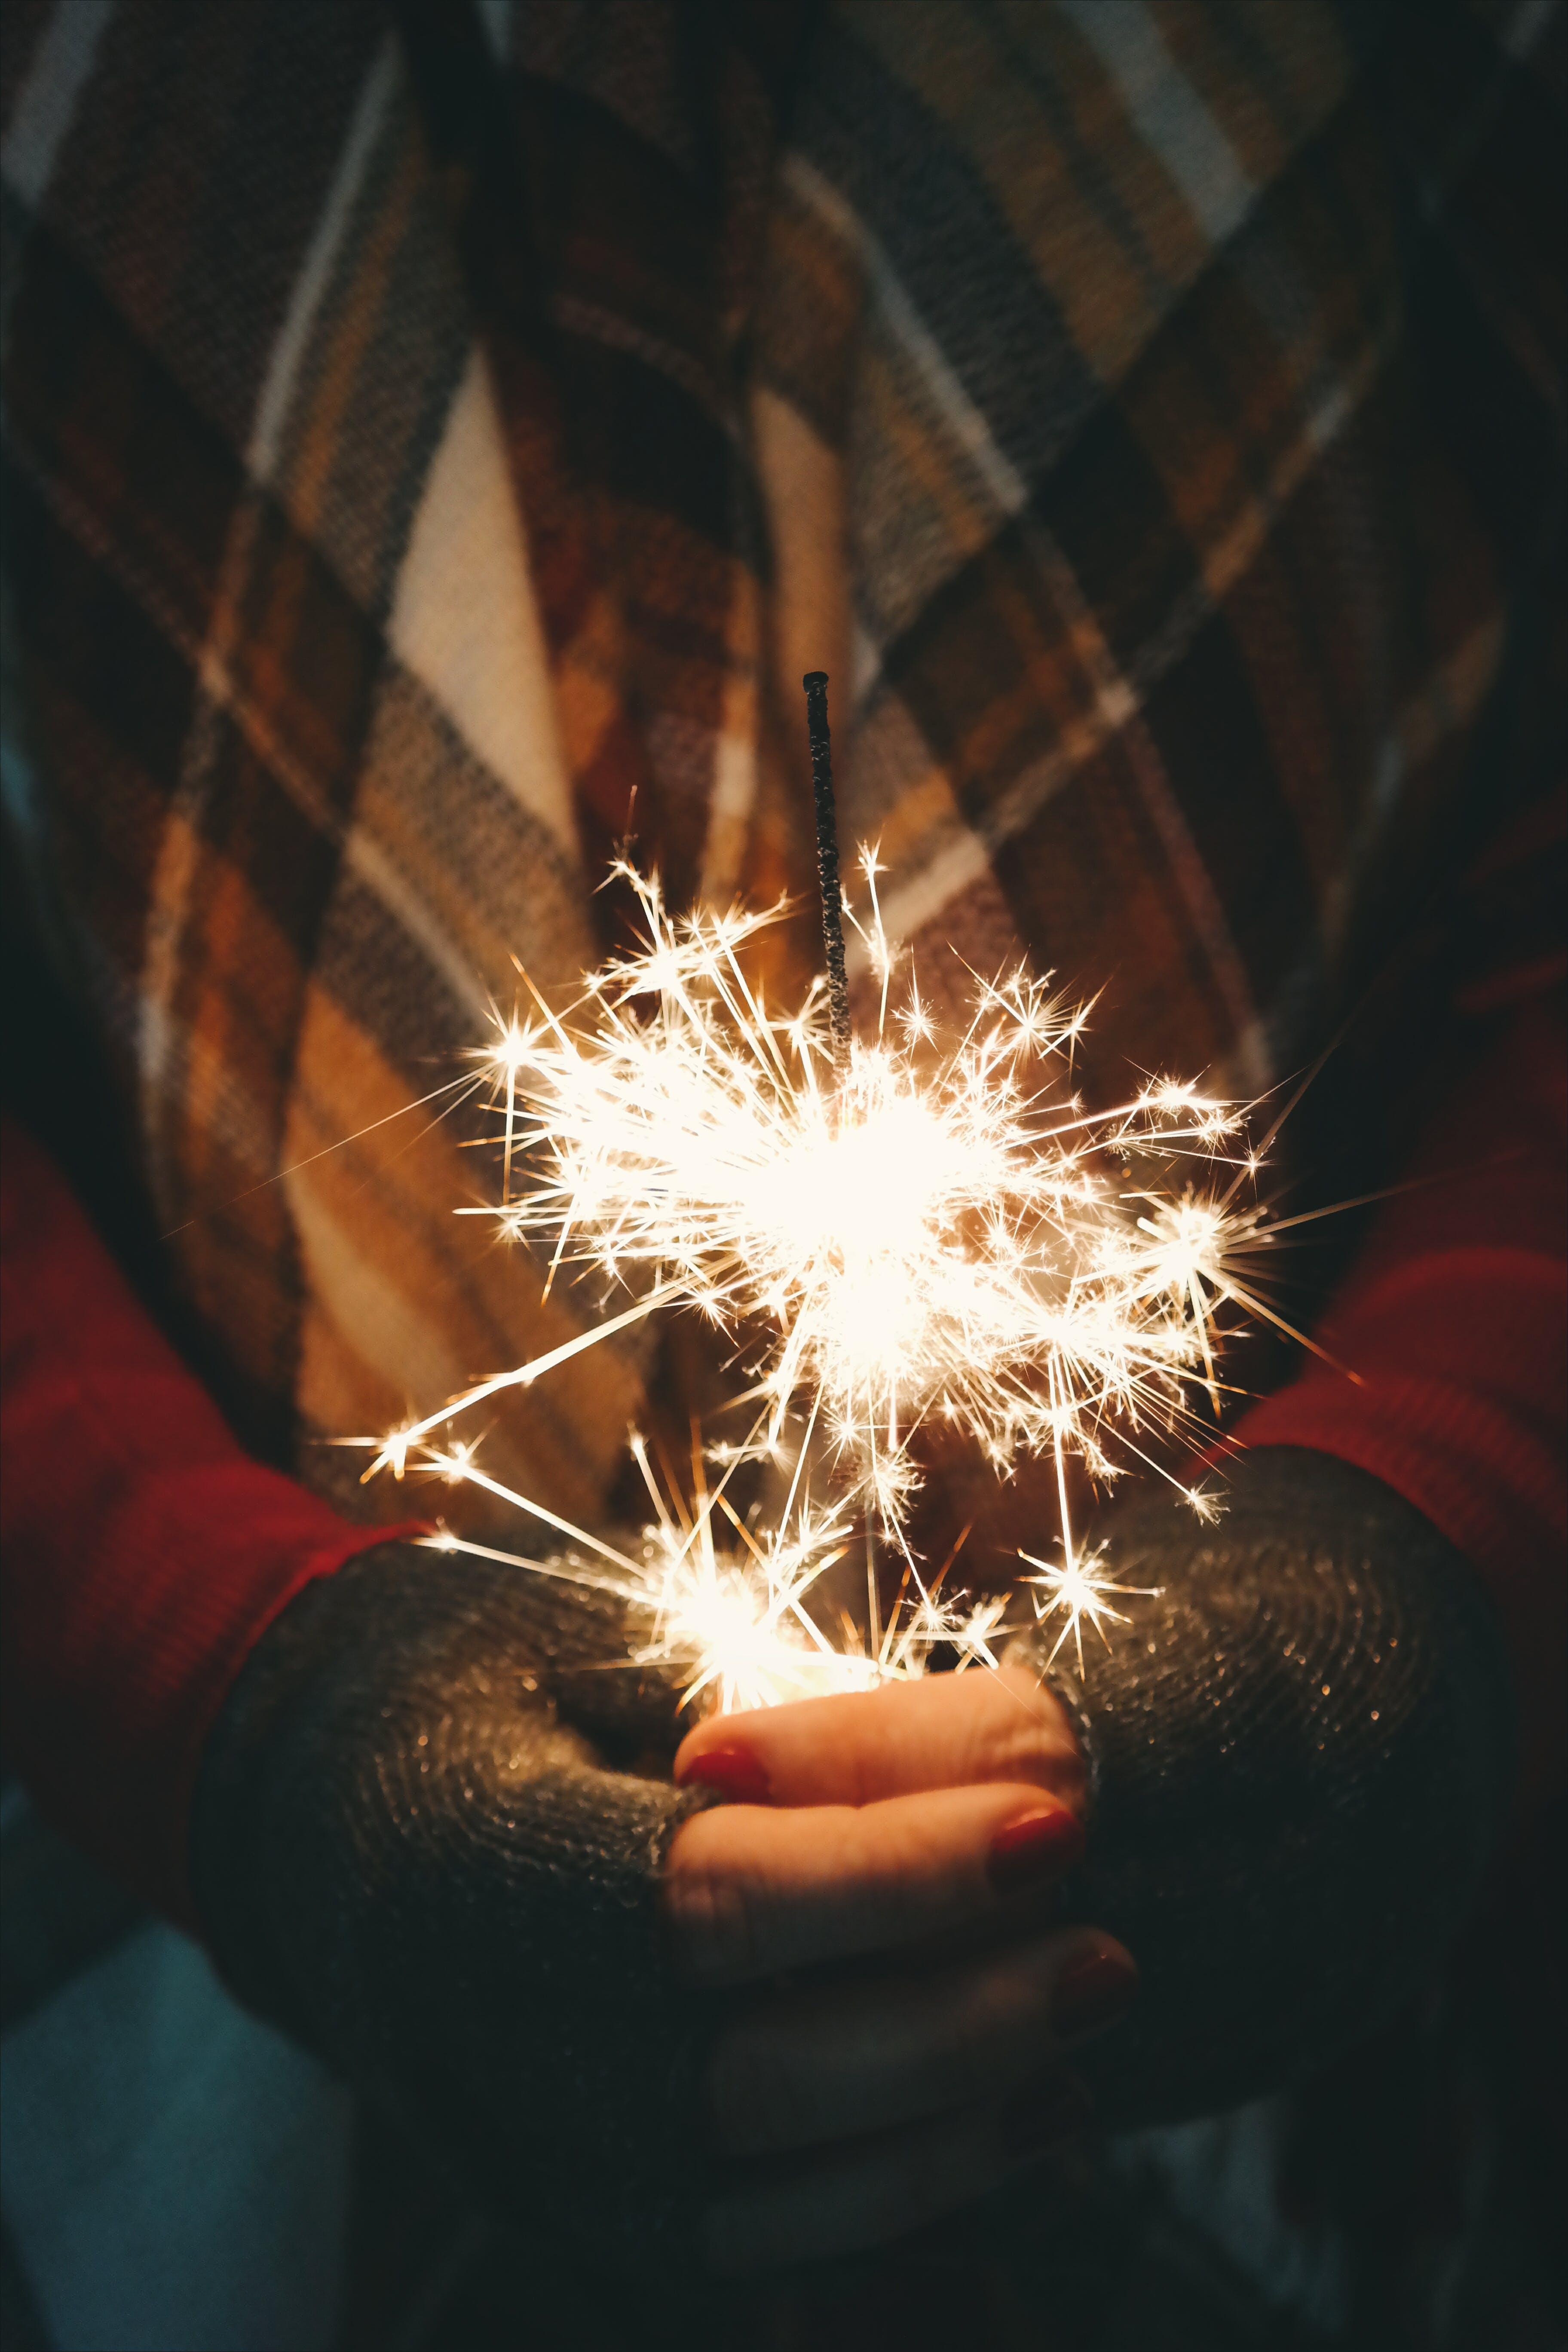 Free stock photo of light, hands, lights, night